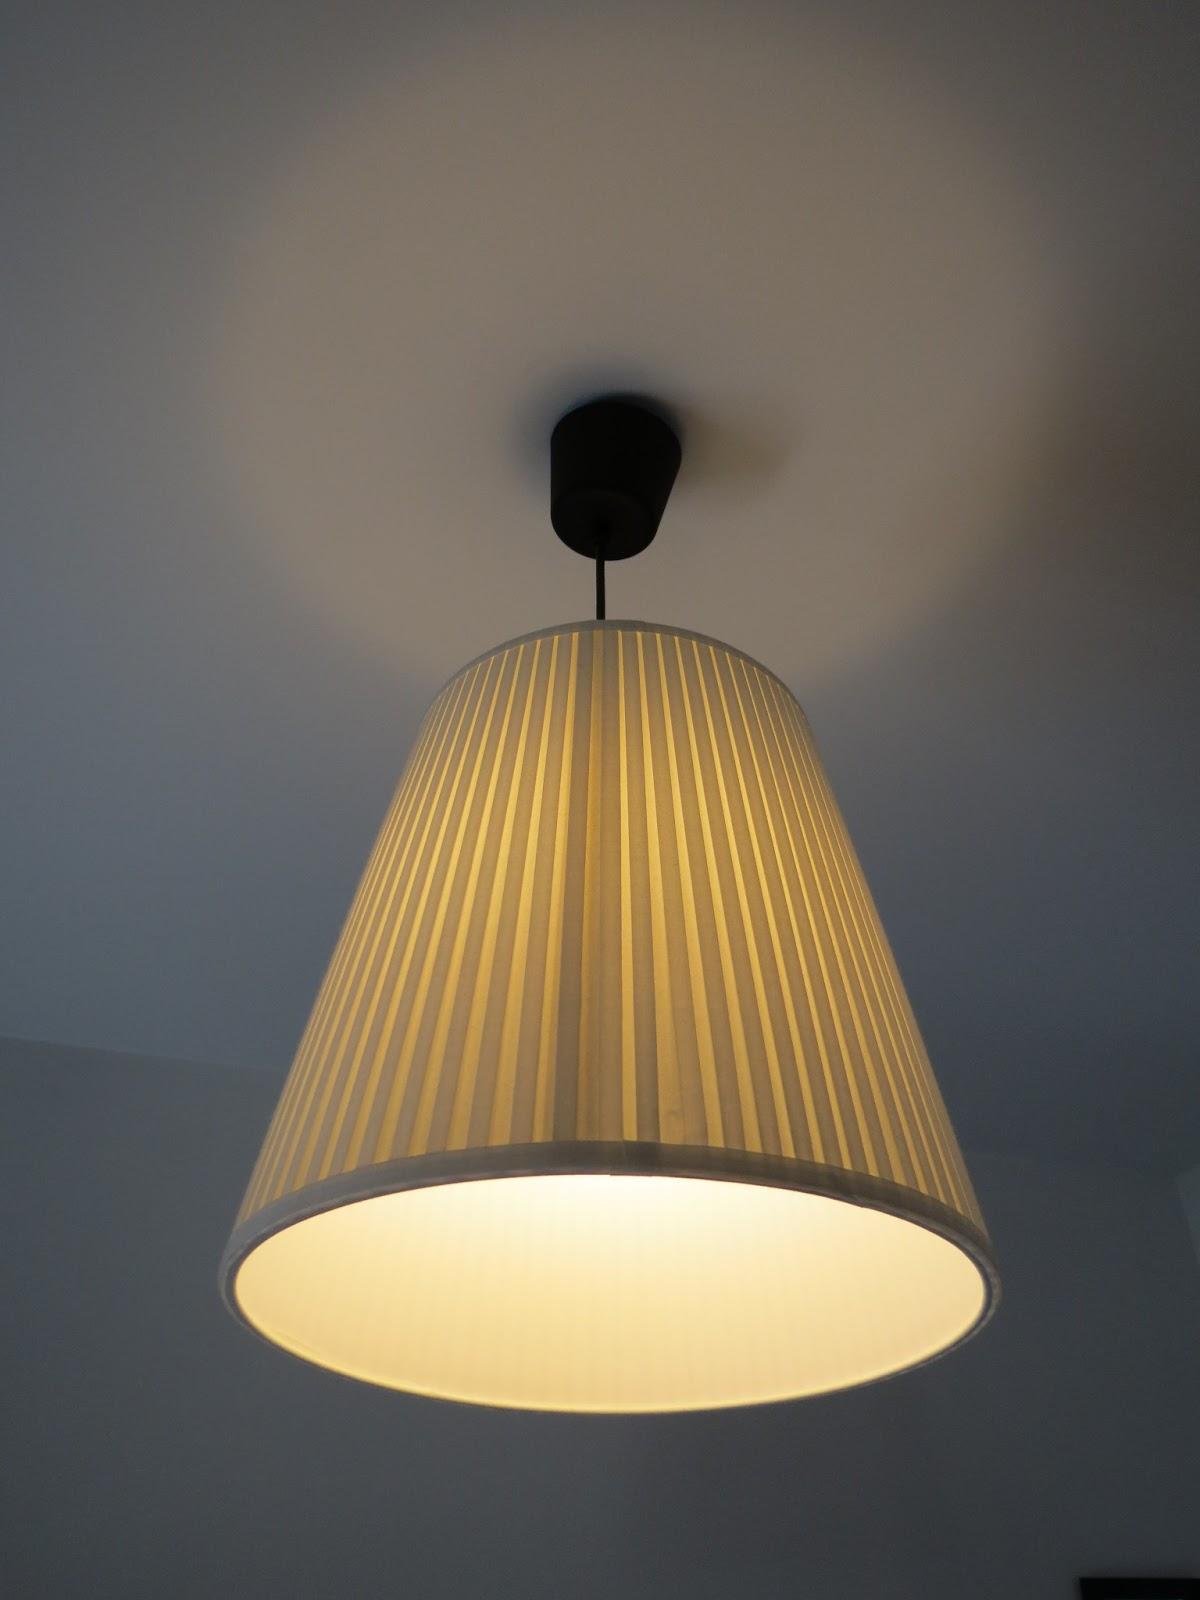 Lamparas Salon Ikea Arquitectura Del Hogar Serart Net